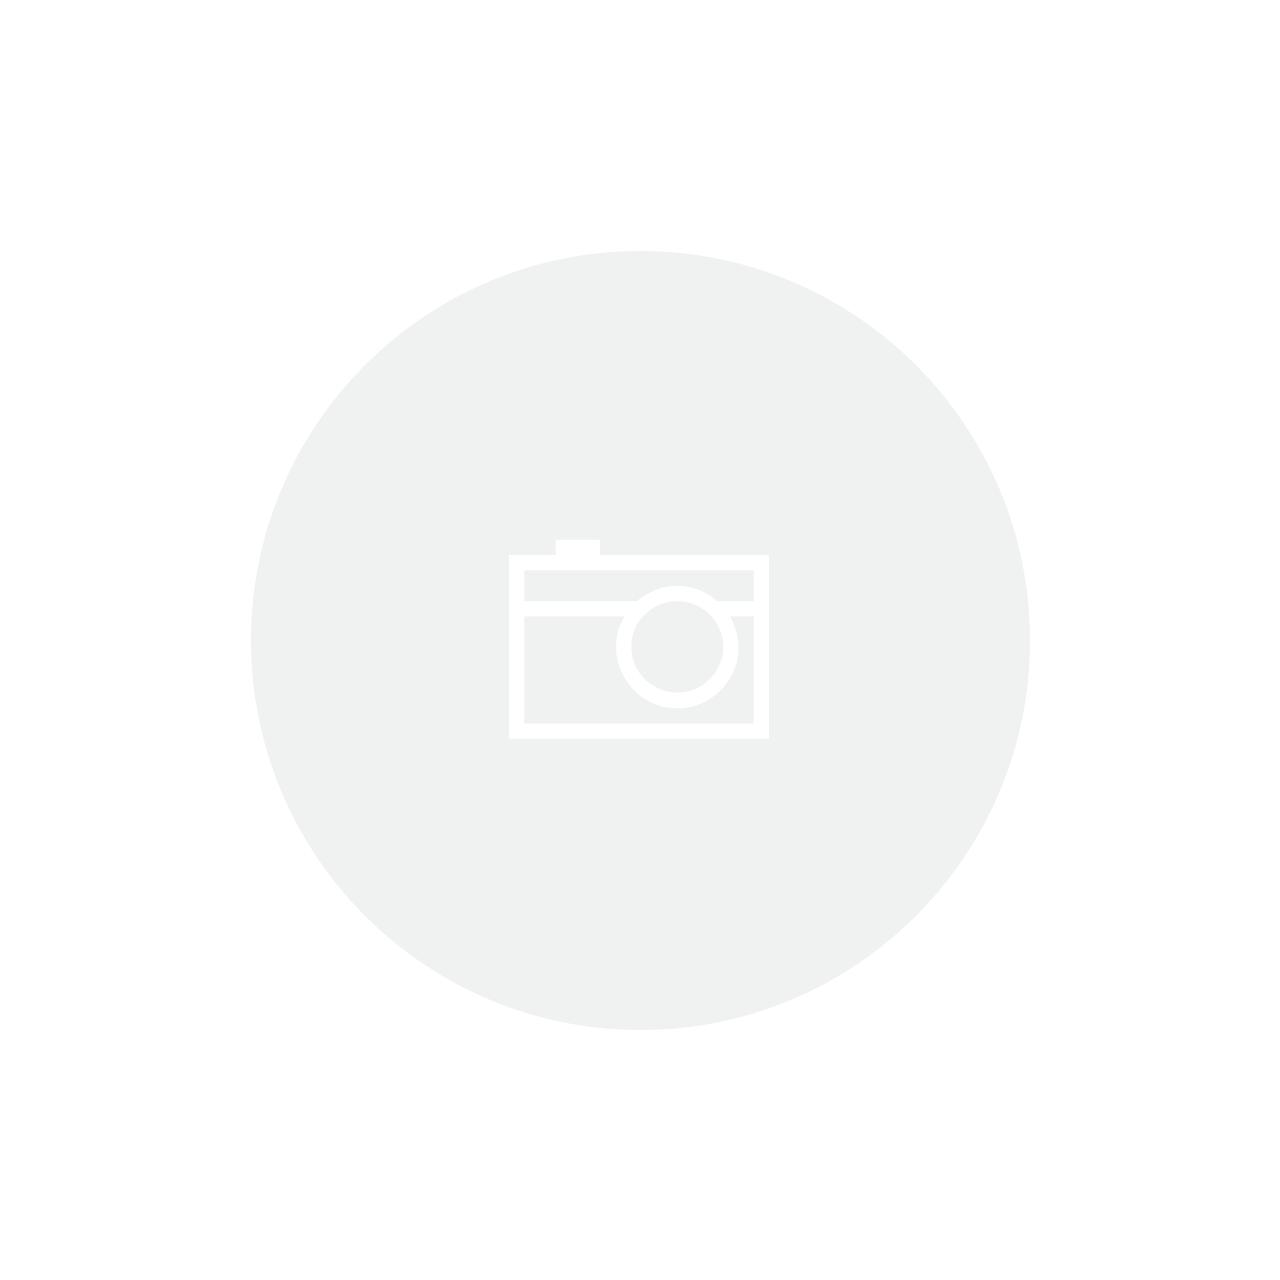 BICICLETA 29 BMC ALPENCHALLENGE 02-THREE 2019 18V SORA